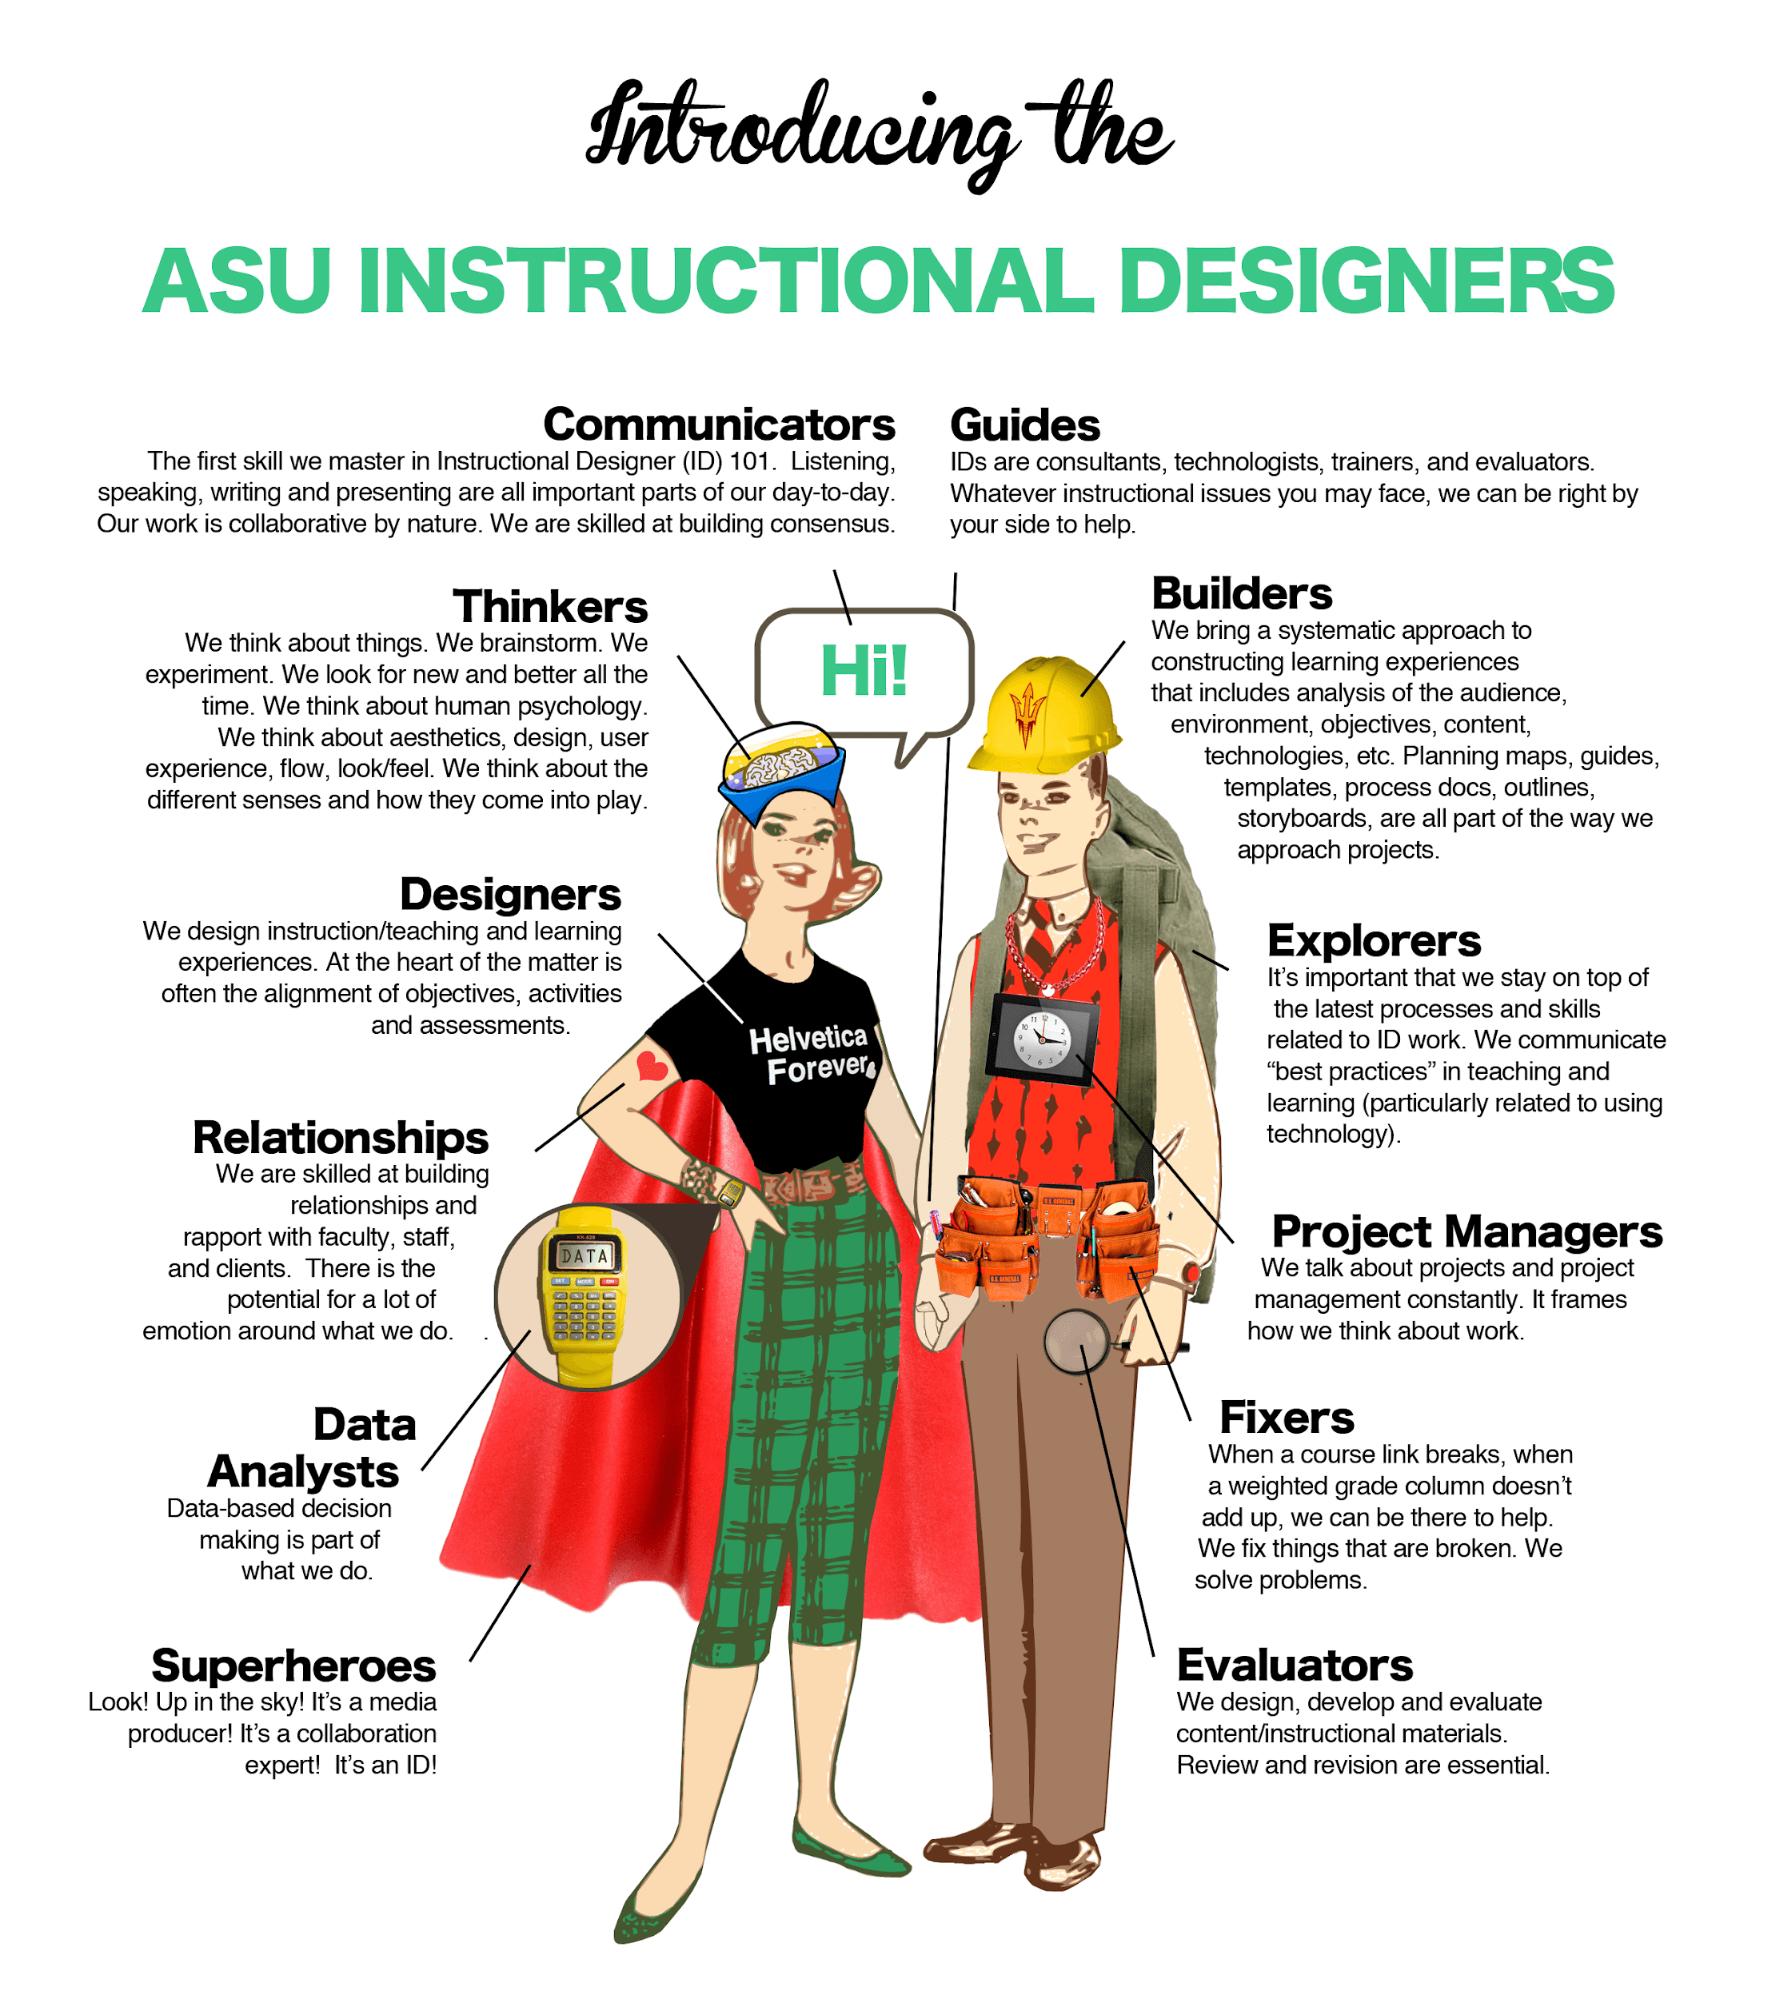 A diagram explaining 12 different roles of an instructional designer